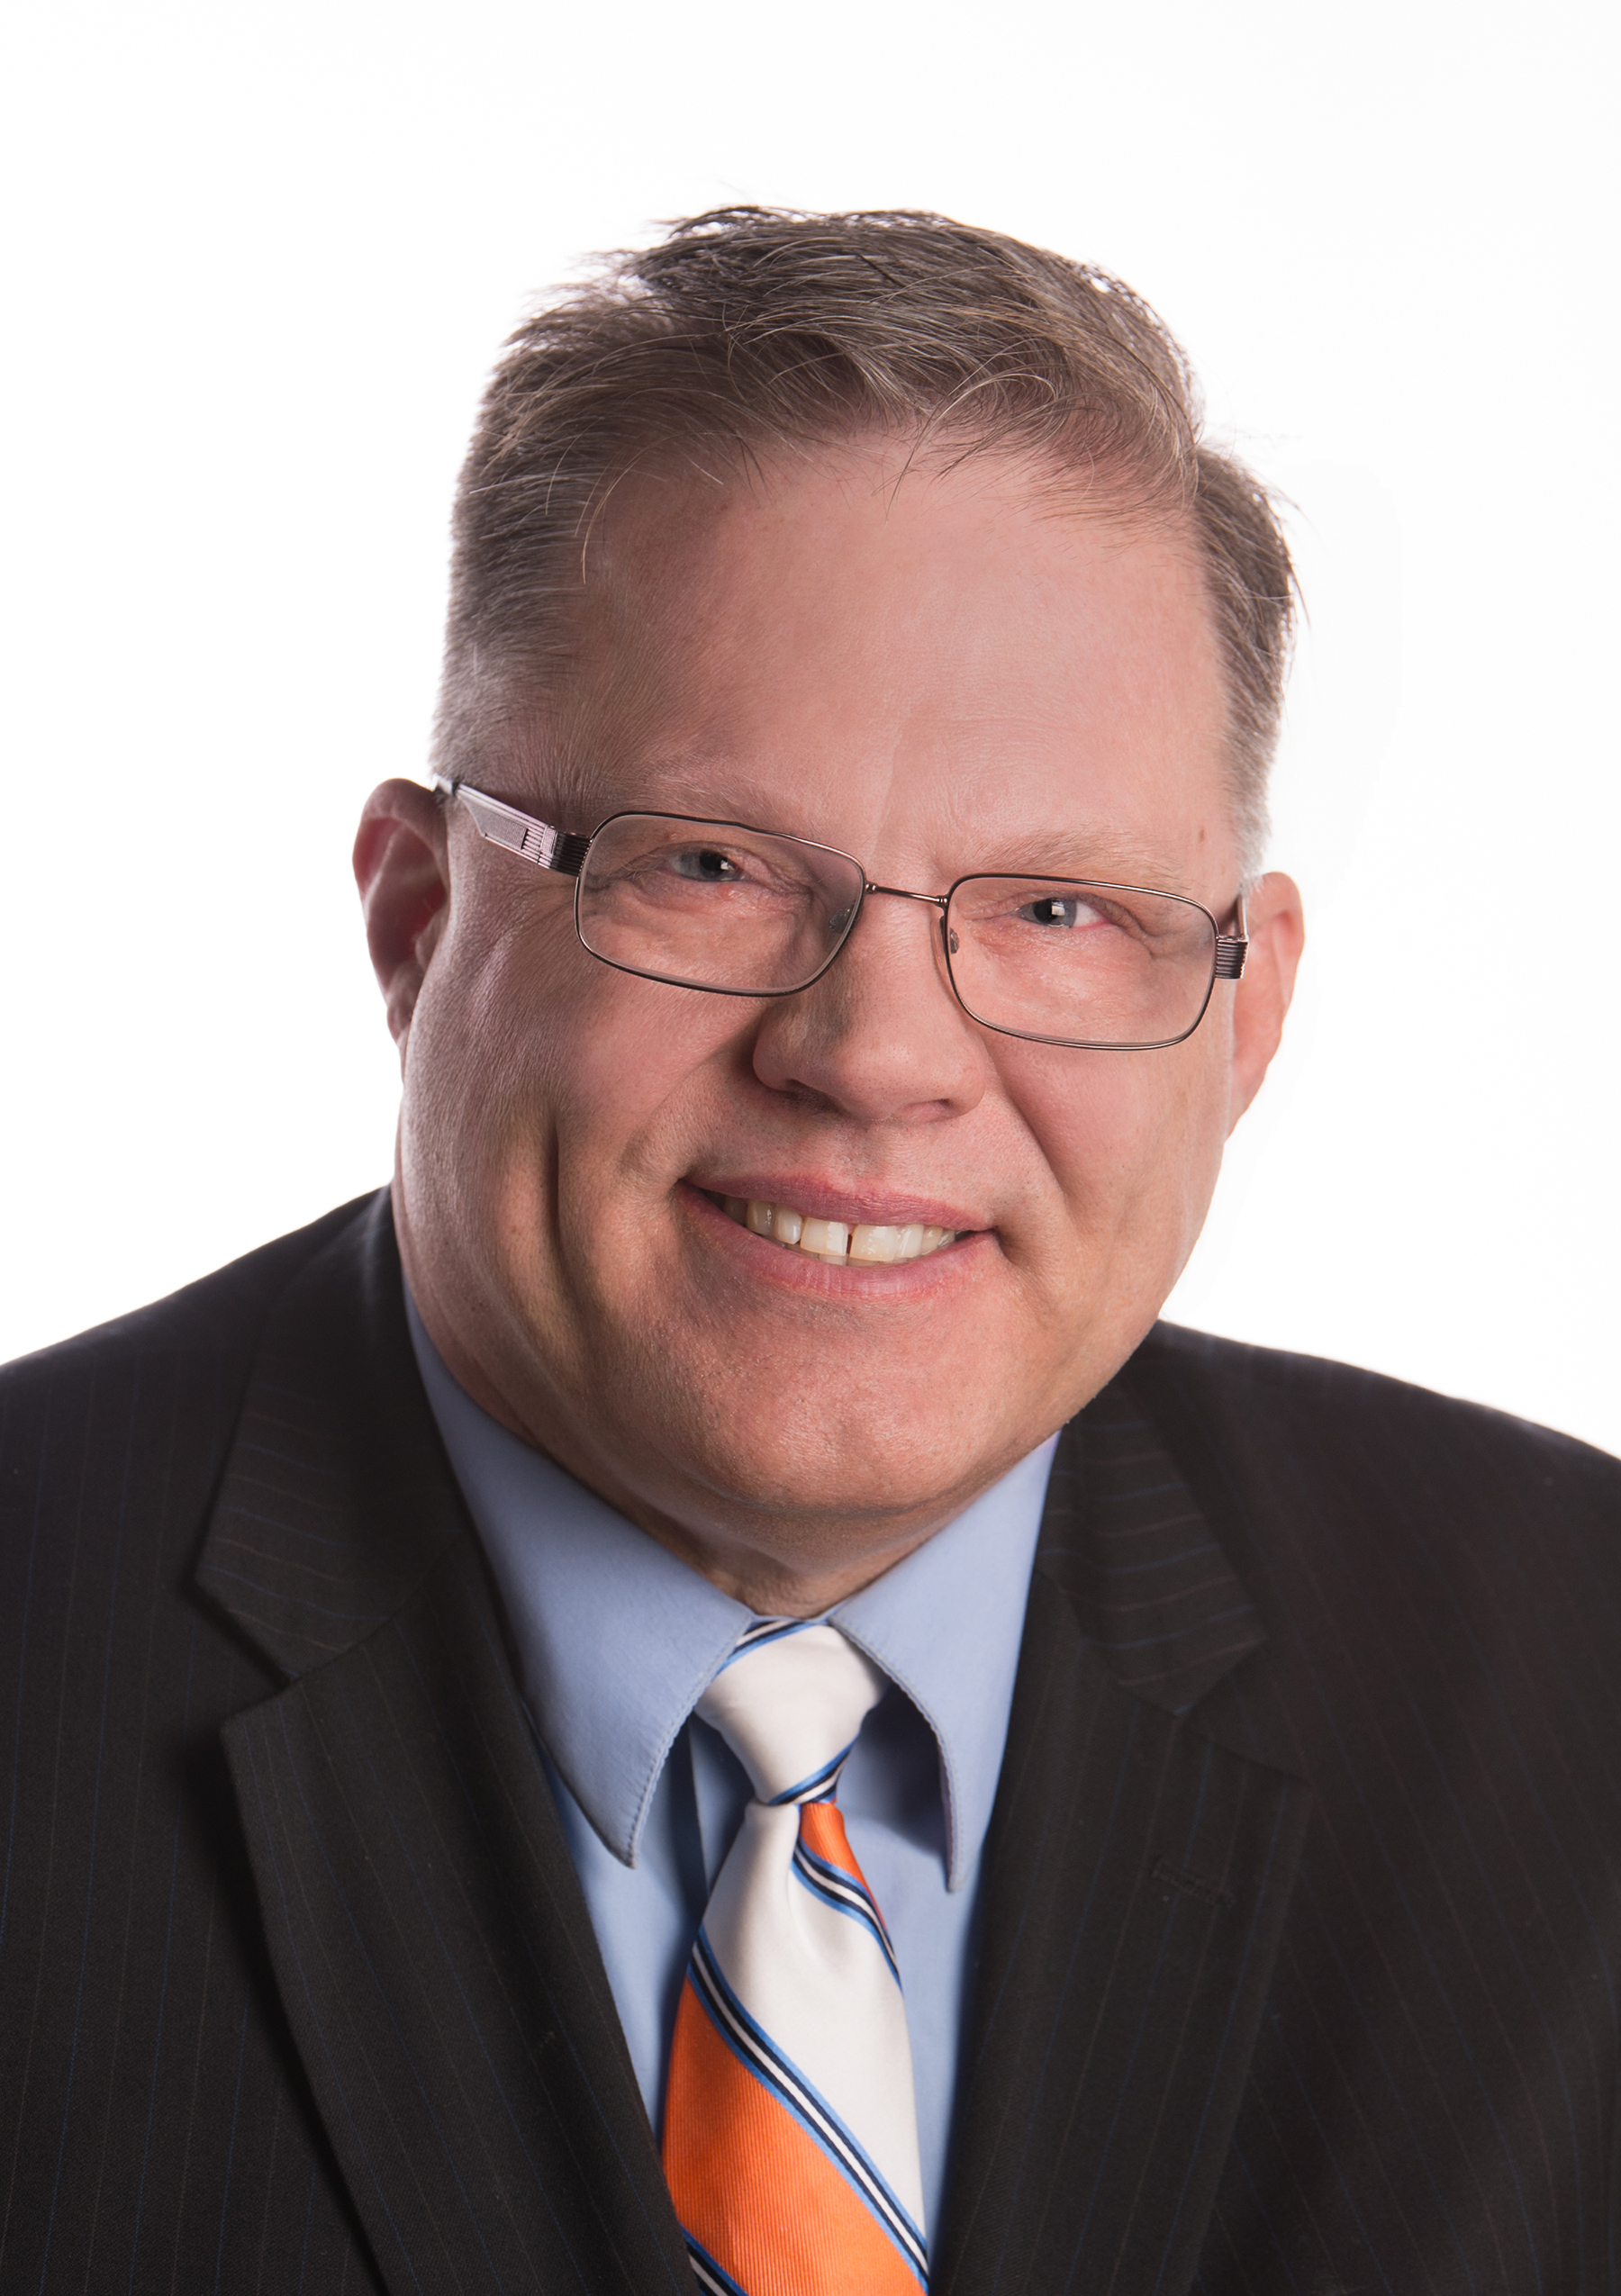 John Chlarson : Public Works Consultant, MTAS